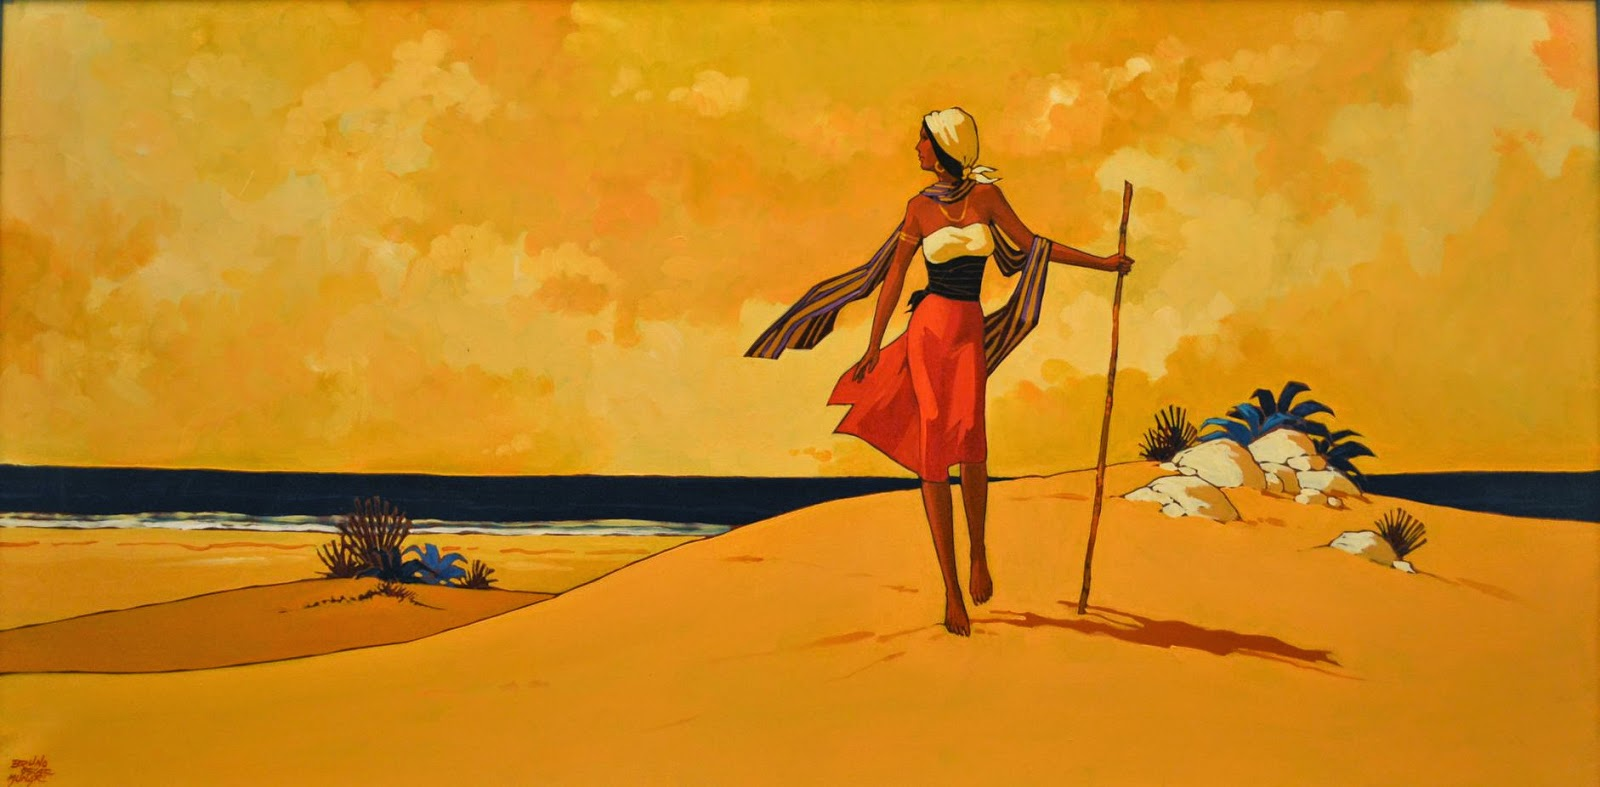 Top VERSI IN VOLO: Galleria d'arte: Bruno Oscar Munari NL81